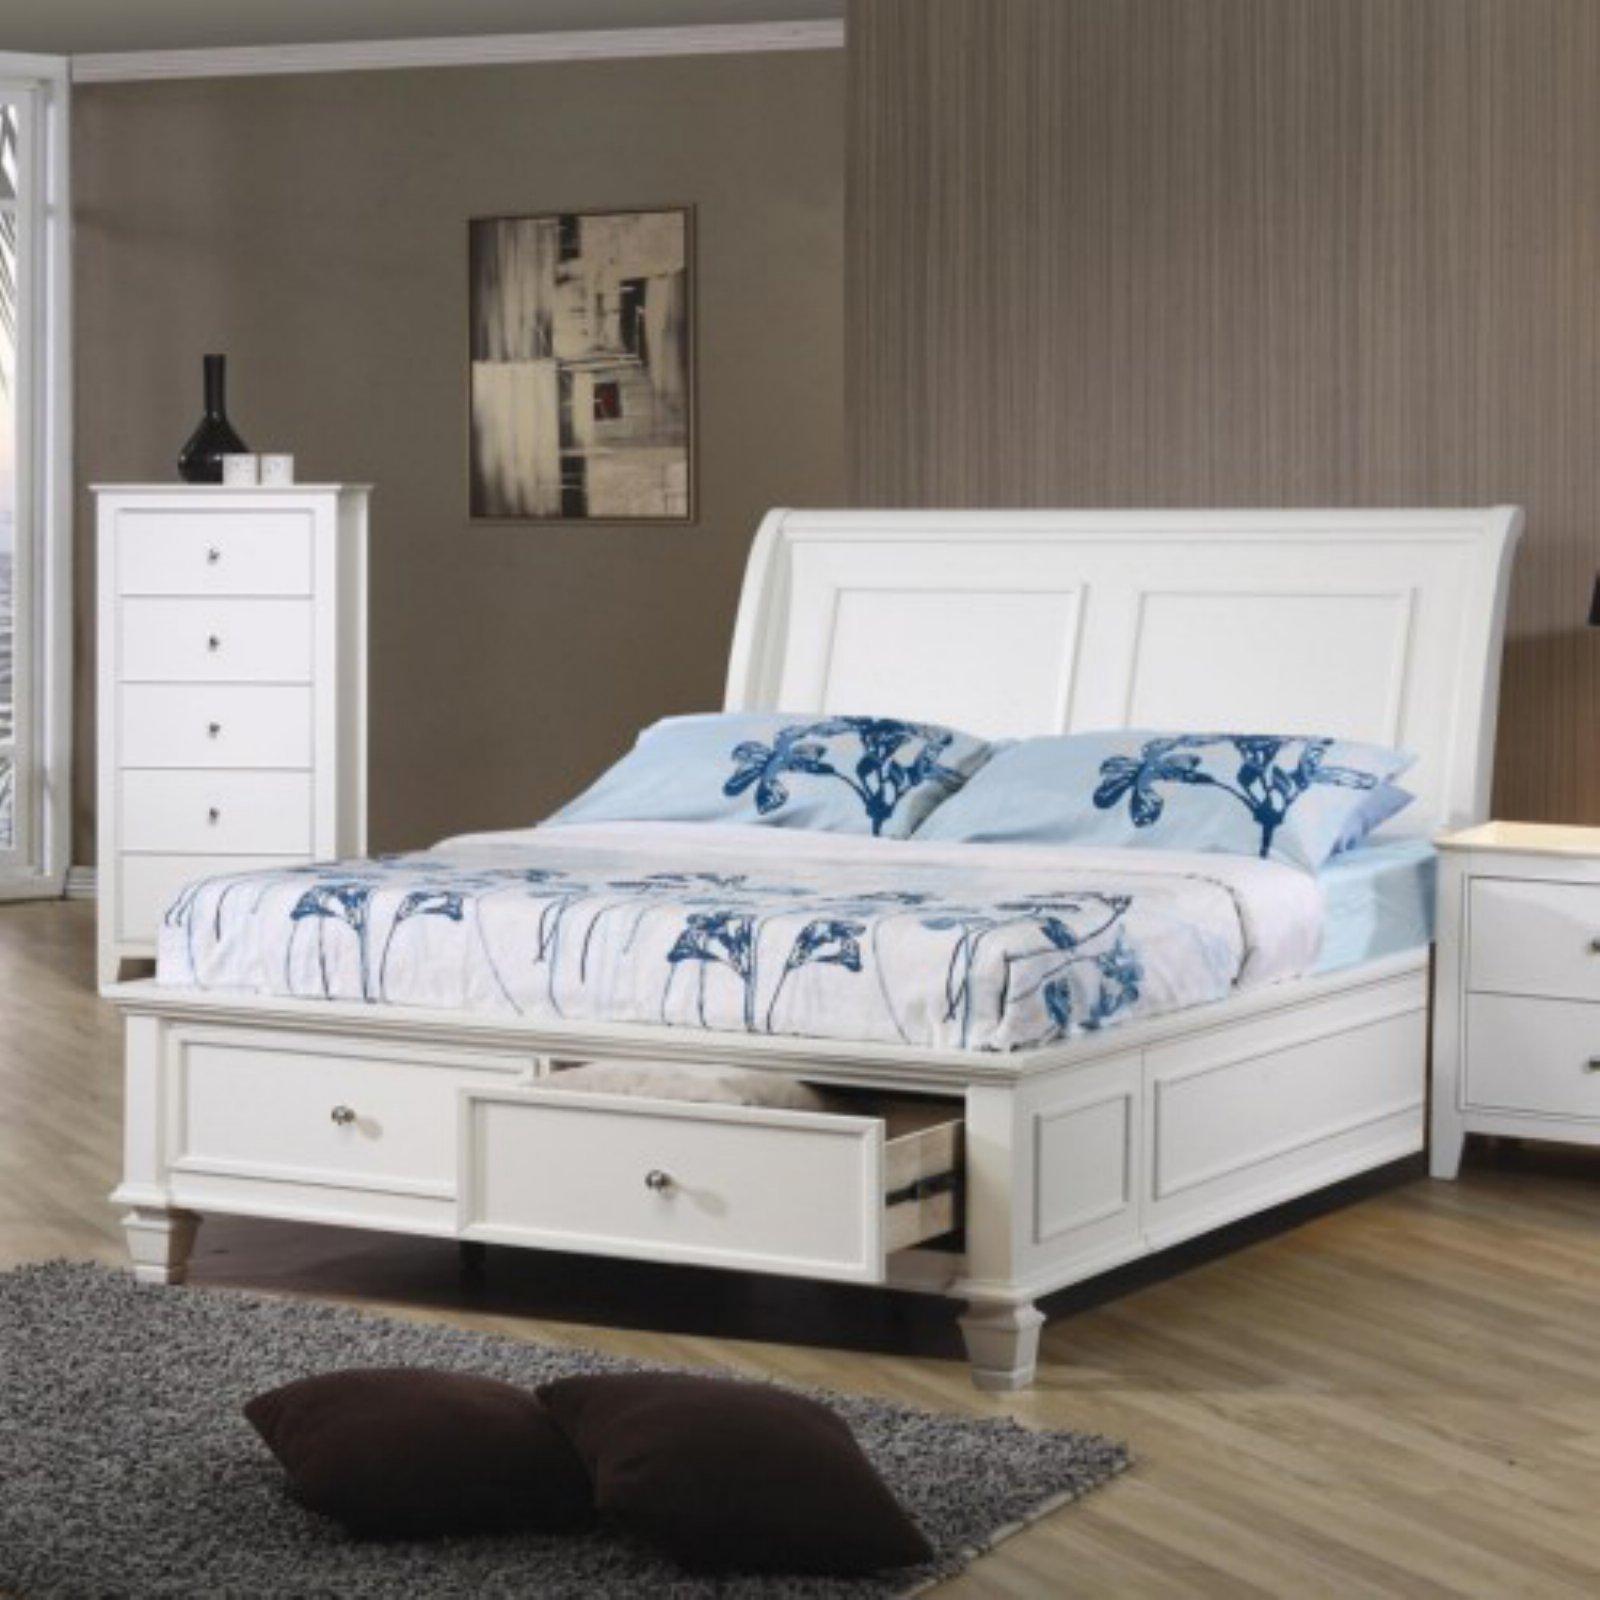 Coaster Furniture Selena Sleigh Bed with Footboard Storag...